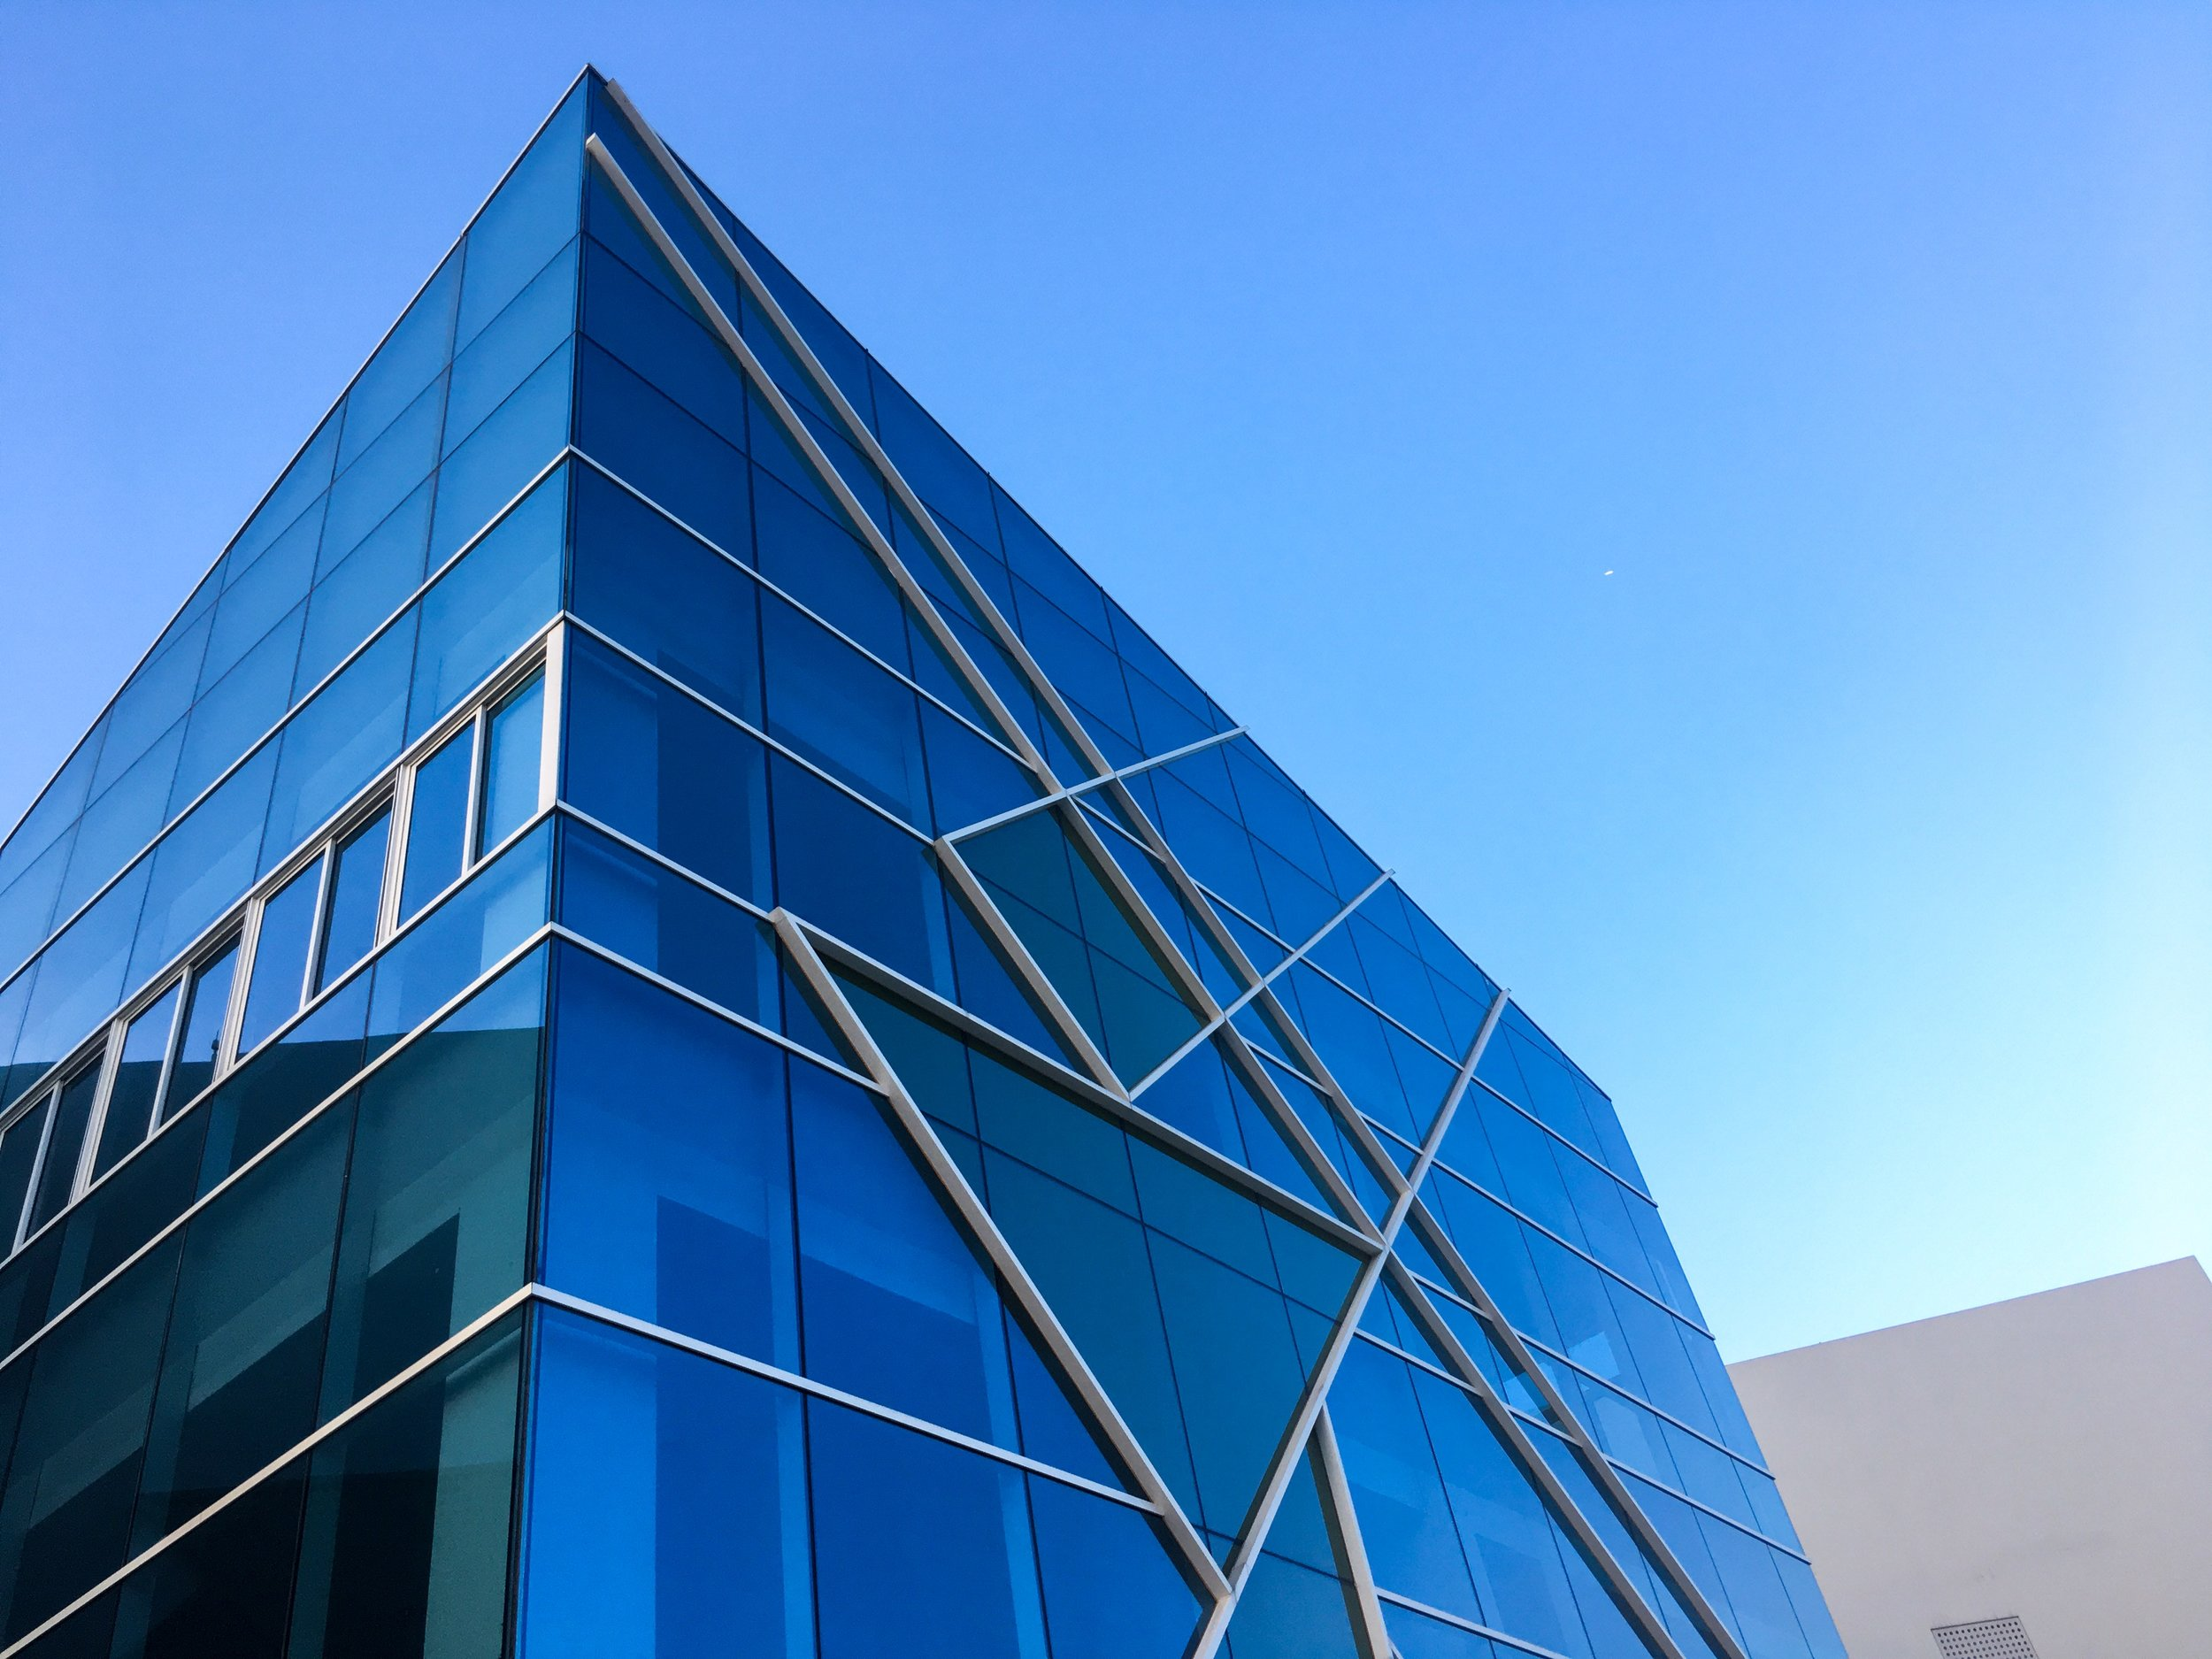 architectural-design-architecture-blue-sky-410696.jpg